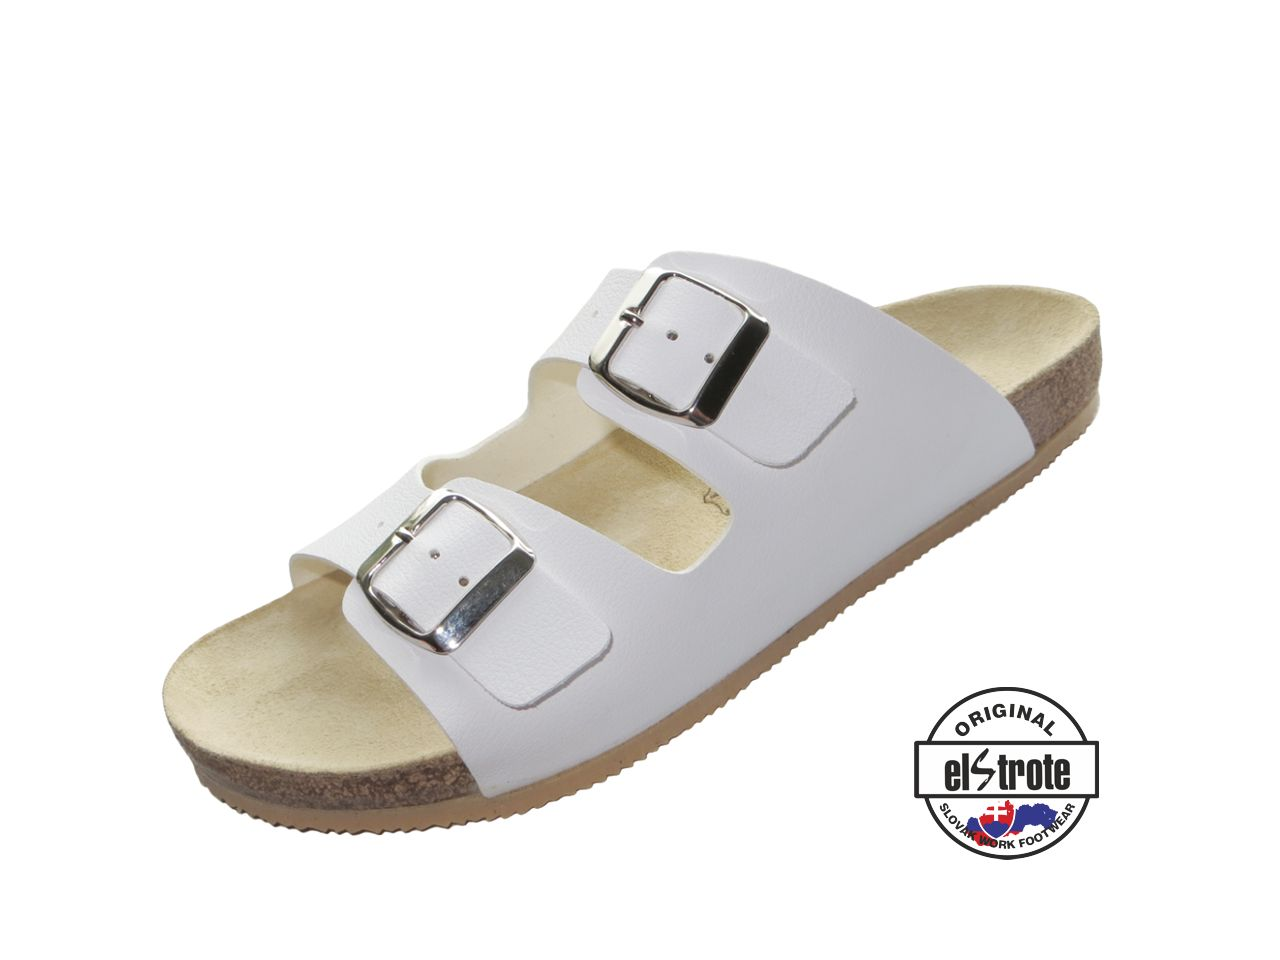 Zdravotná ortopedická obuv - Ortho - pánska - 91 701 P f.10  mixxer.sk 0979af24a5